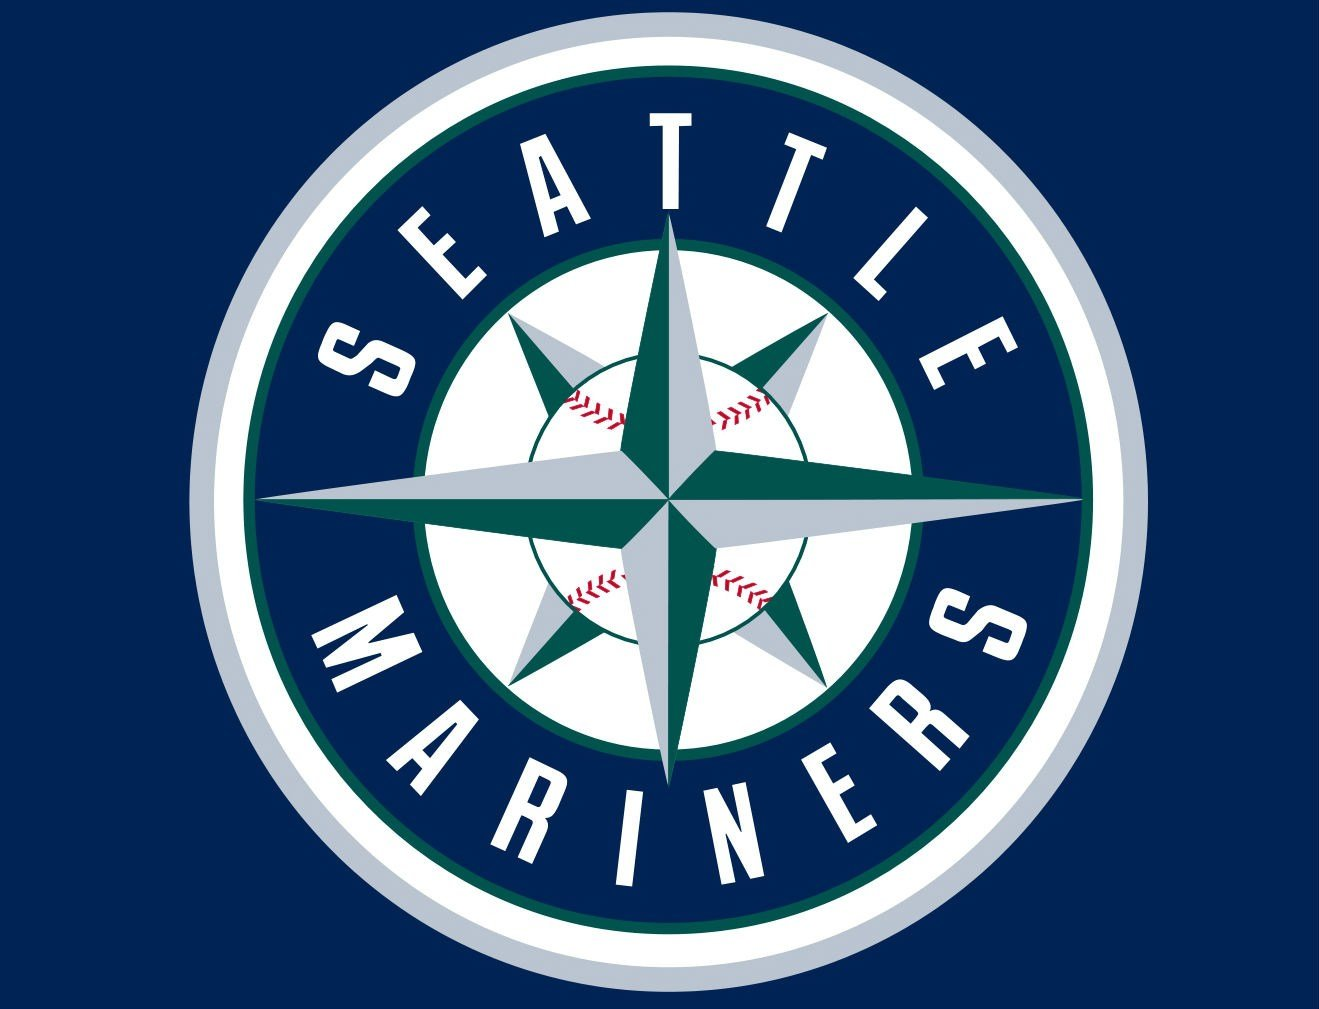 Mariners play Blue Jays again tomorrow at 4:07 p.m.